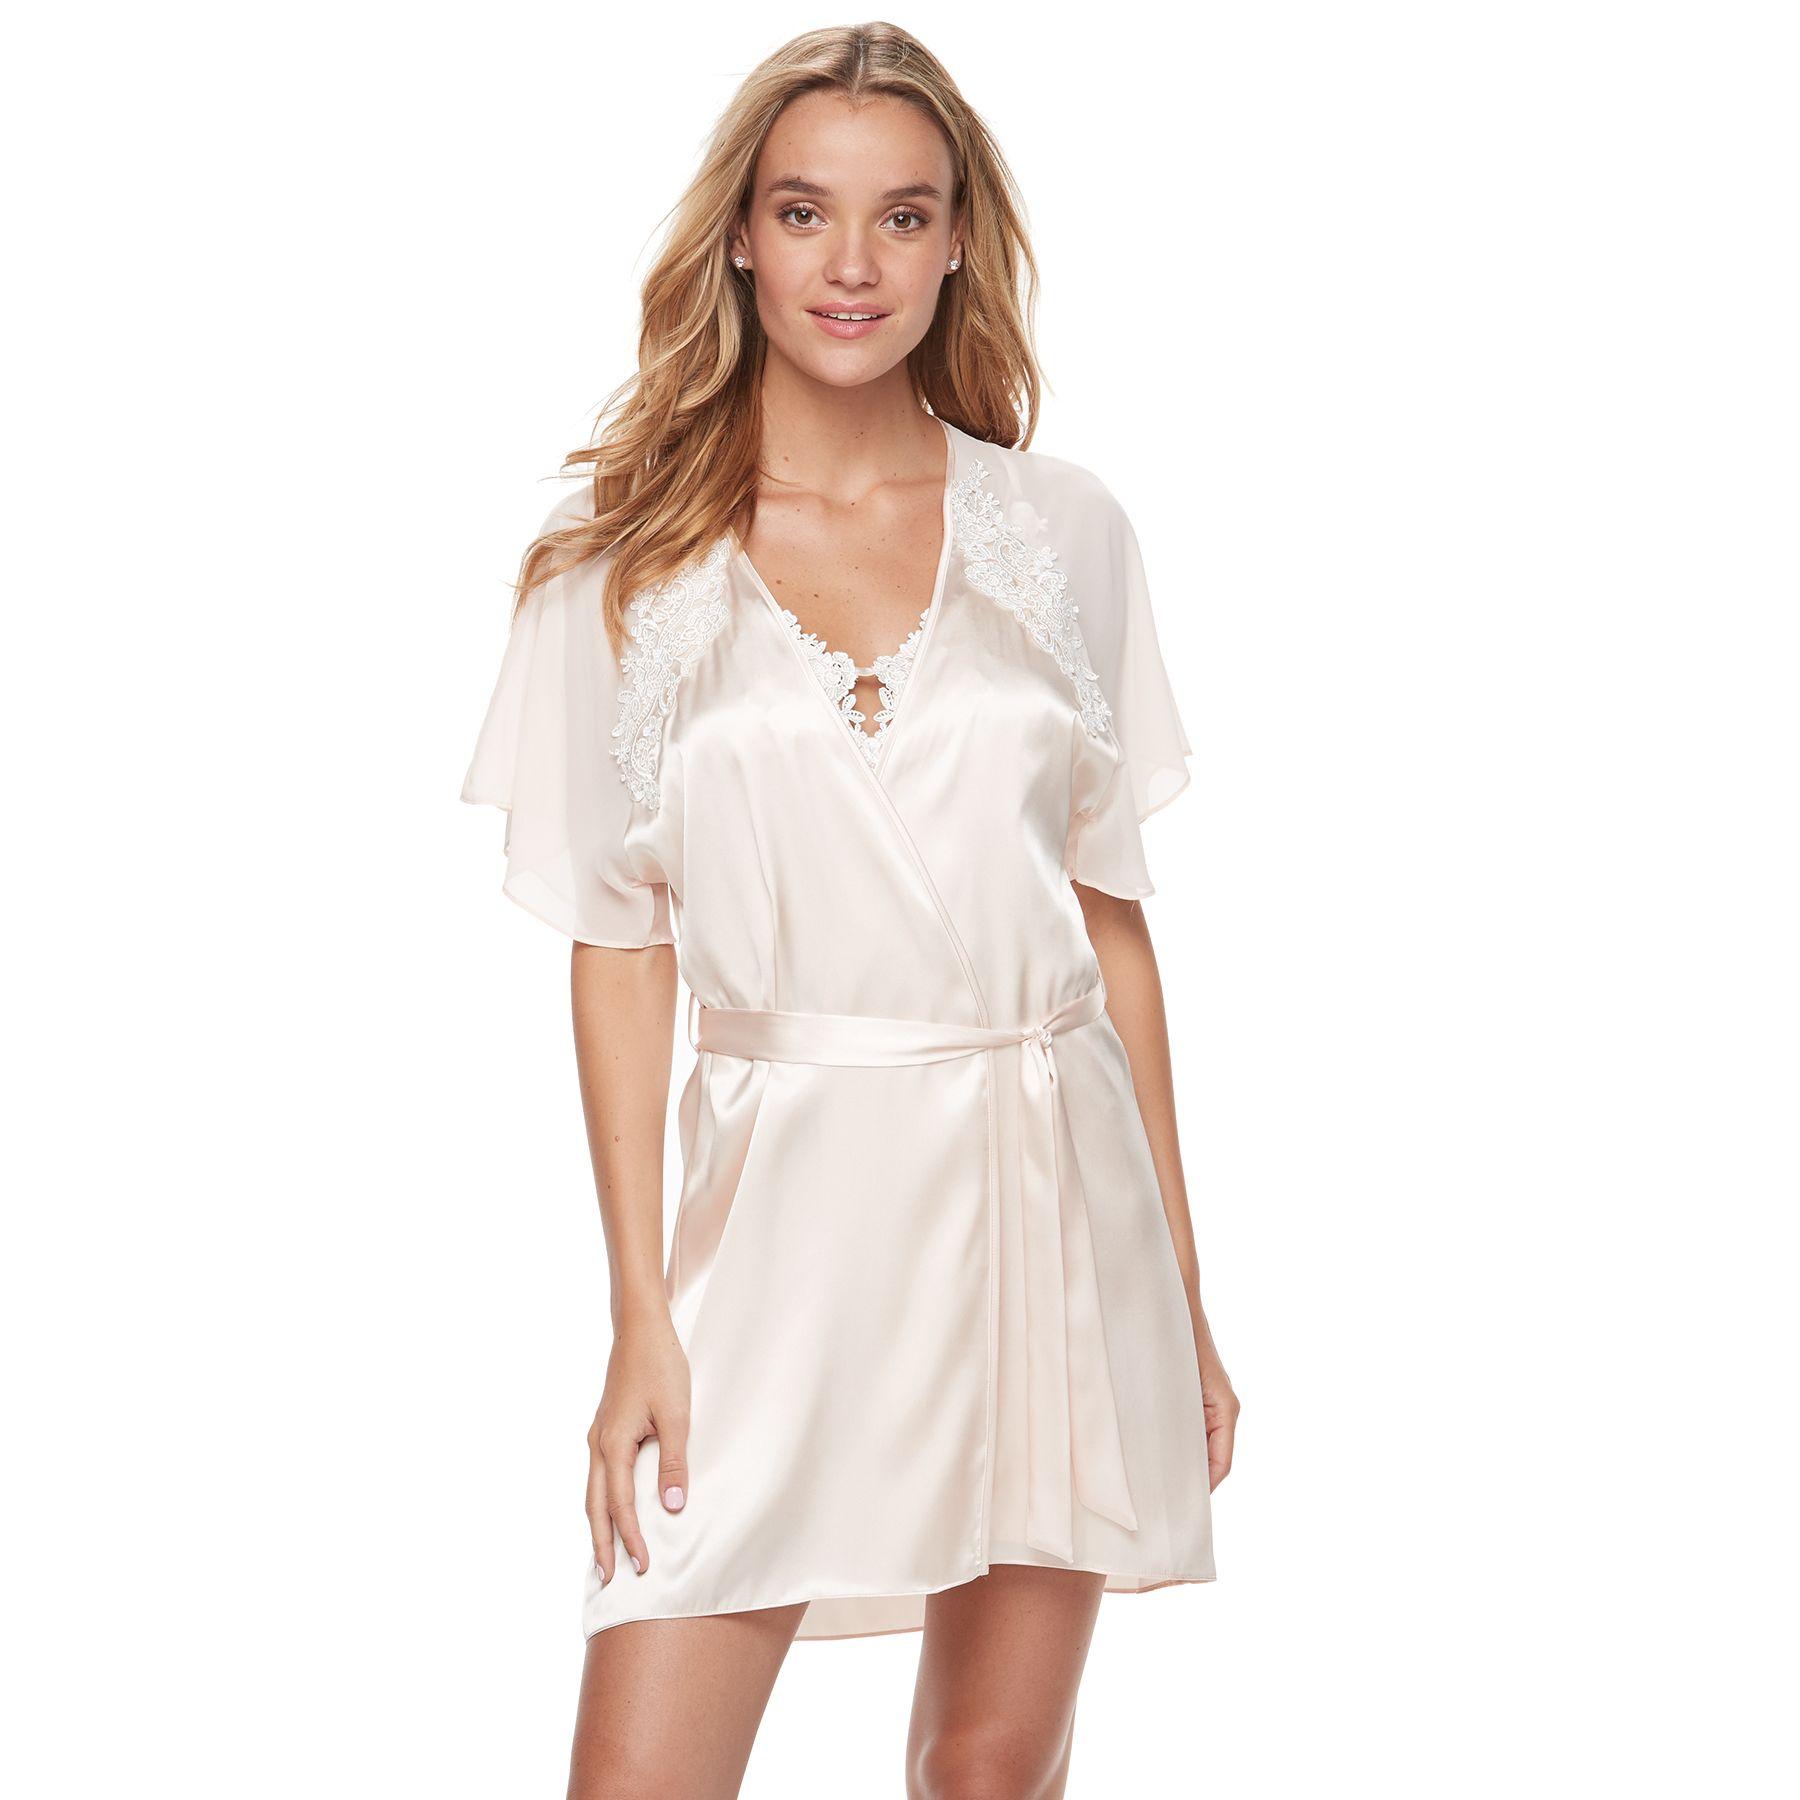 Short Wedding Dresses 2.0.1.5 Size